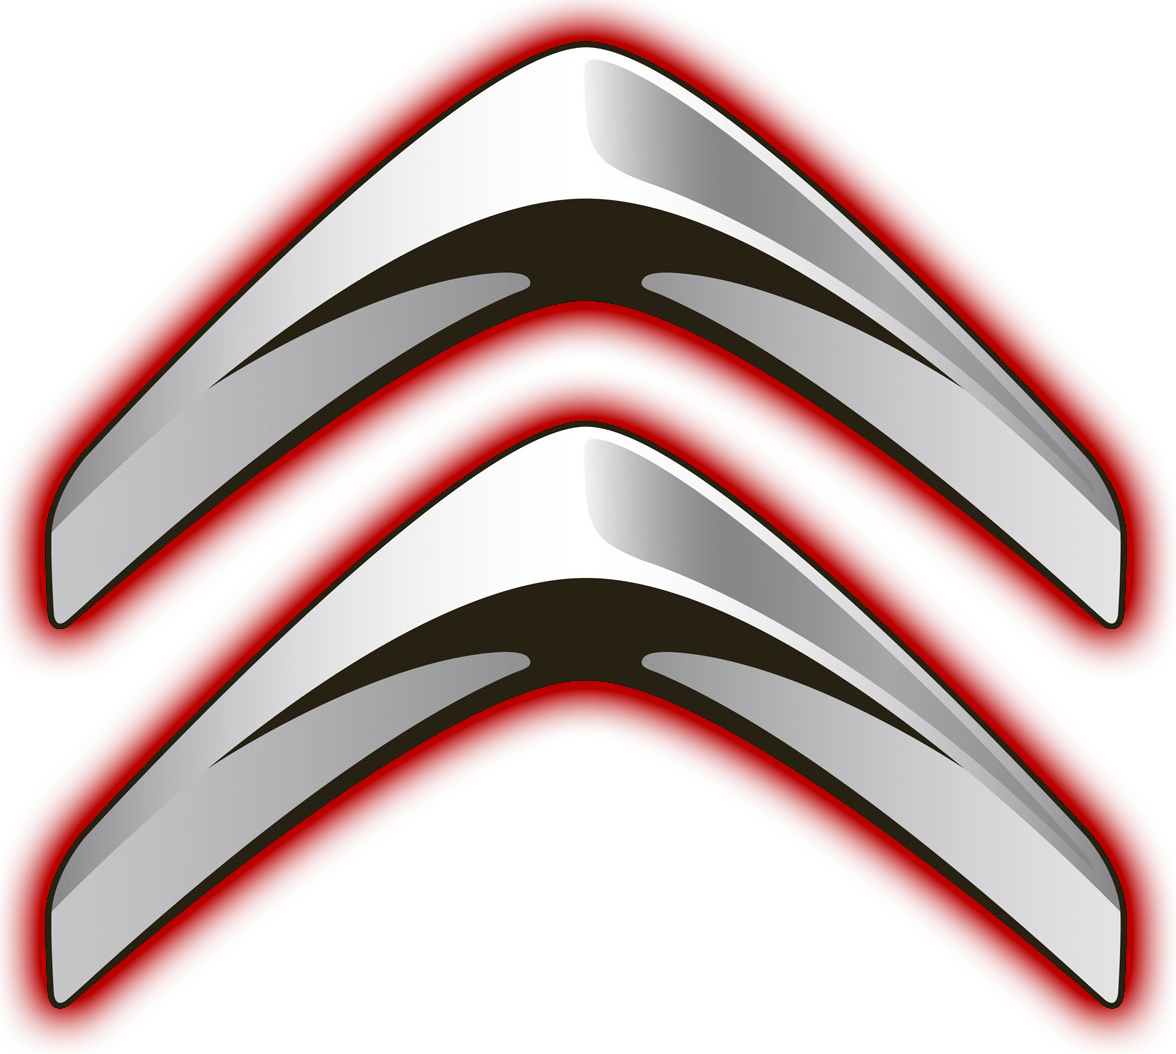 Citroen Logo Citroen Car Symbol Meaning And History Car